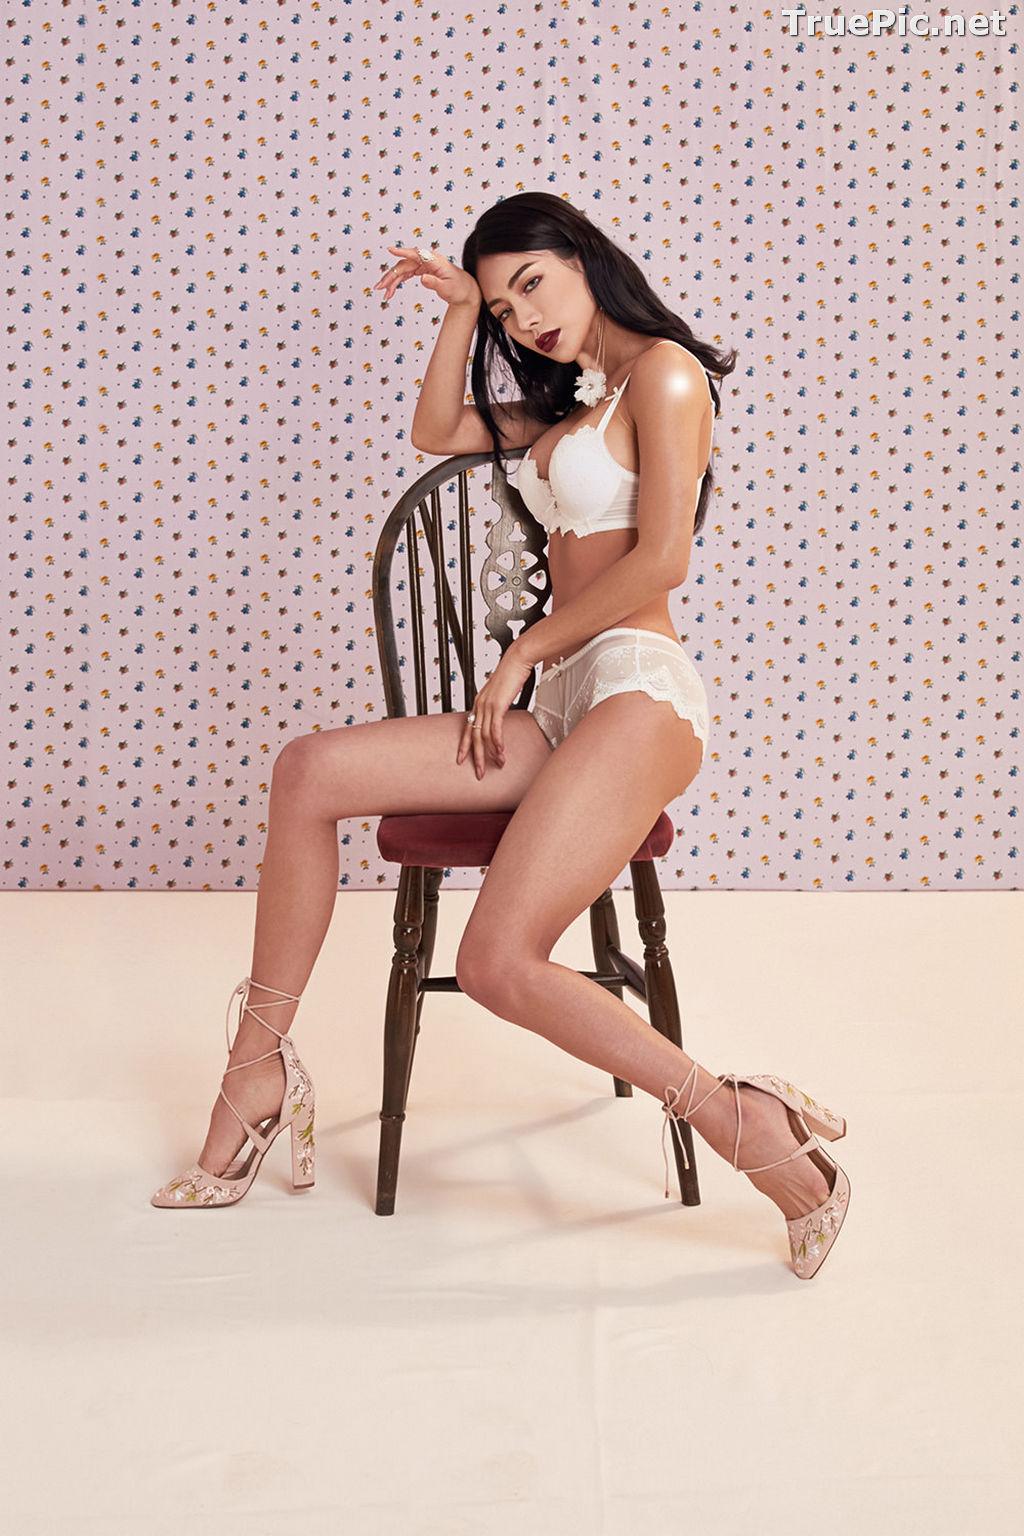 Image Korean Fashion Model - An Seo Rin - White Lingerie and Sleepwear Set - TruePic.net - Picture-7